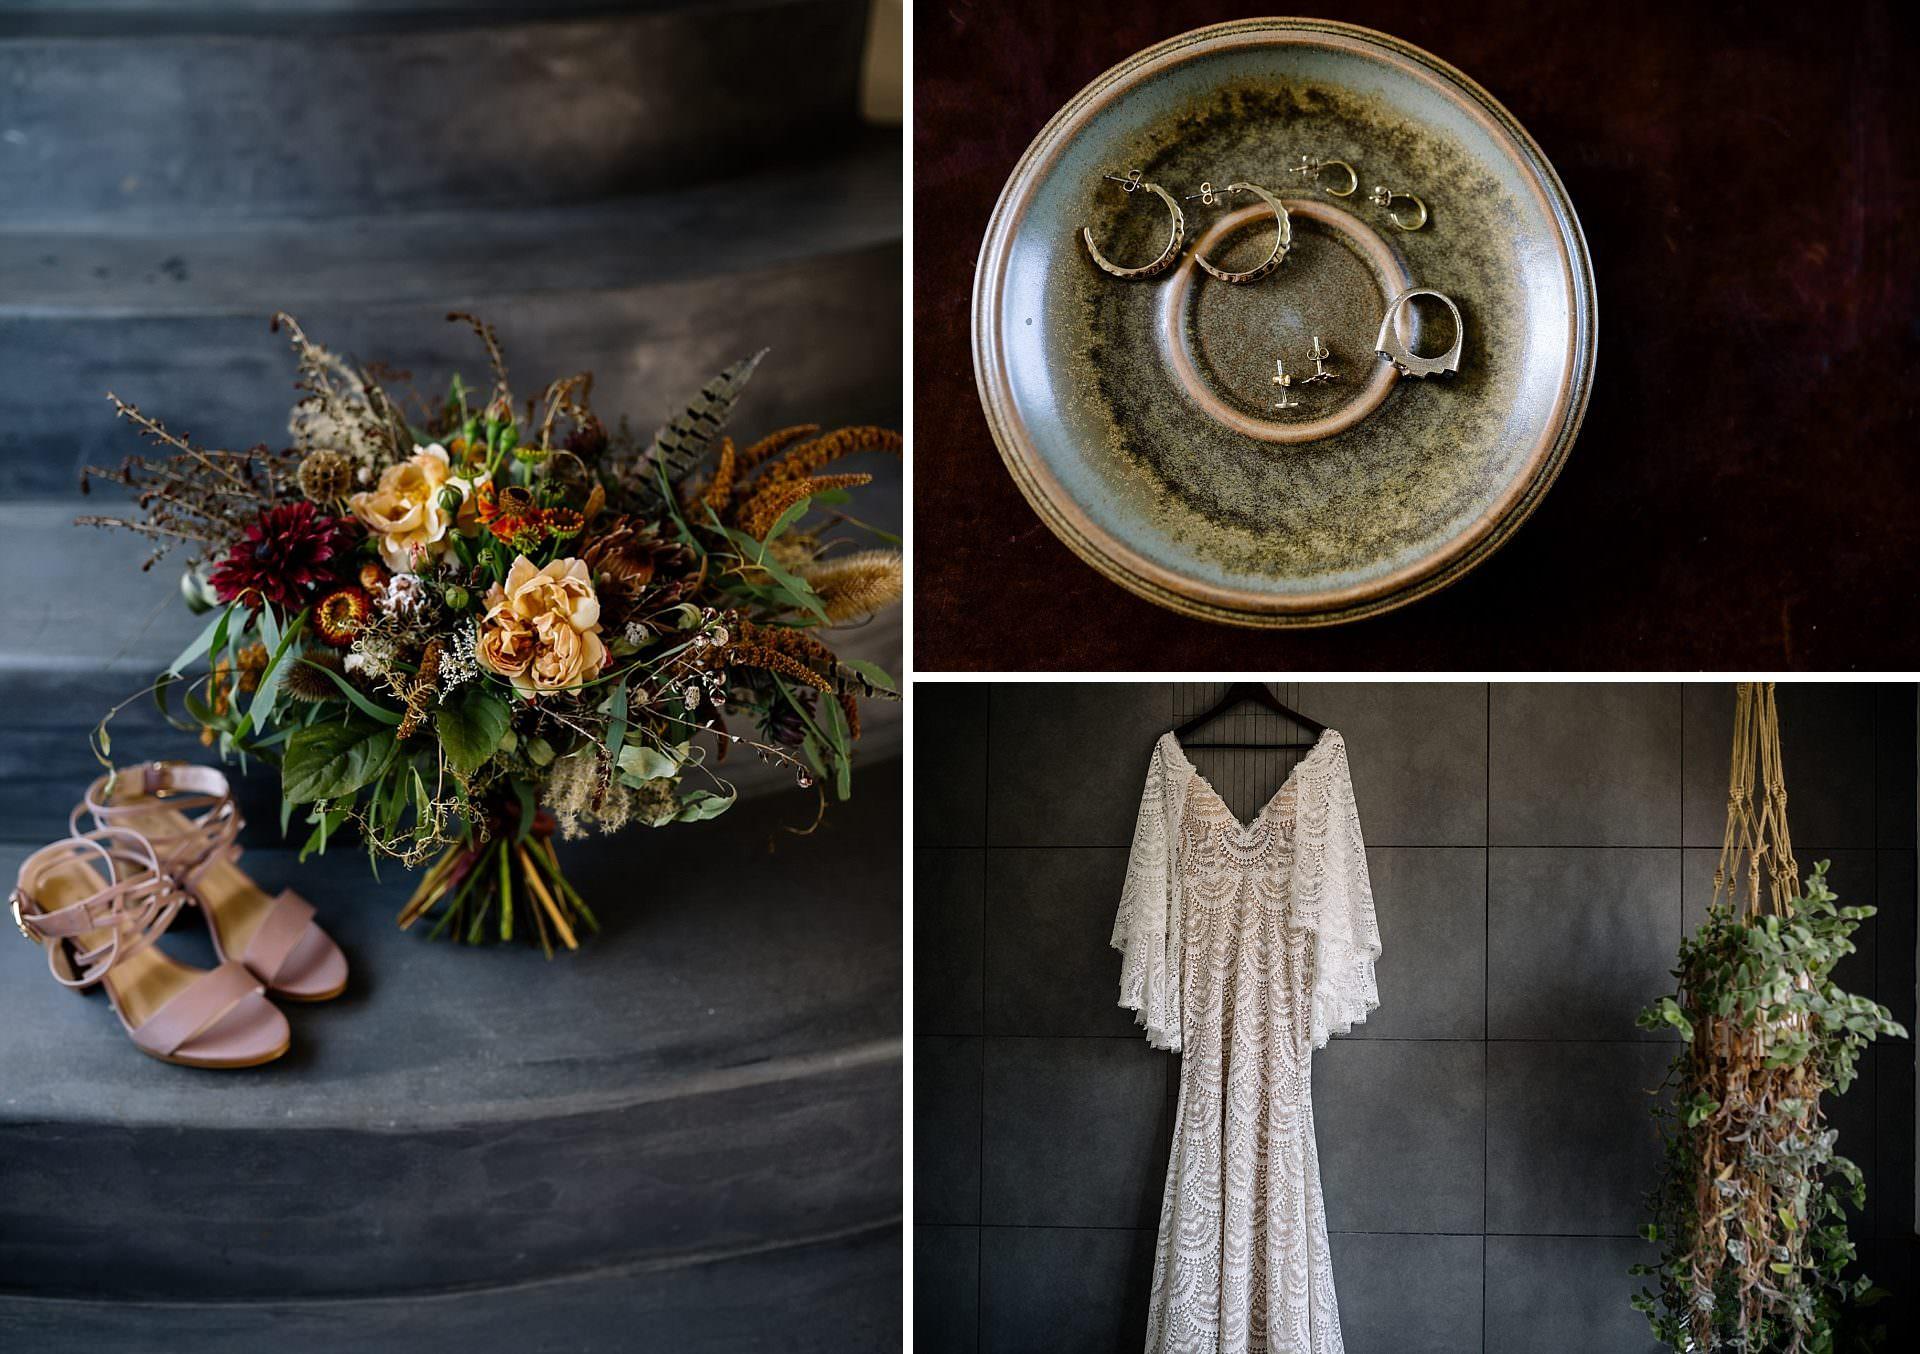 Rustic wedding flowers and Boho wedding dress